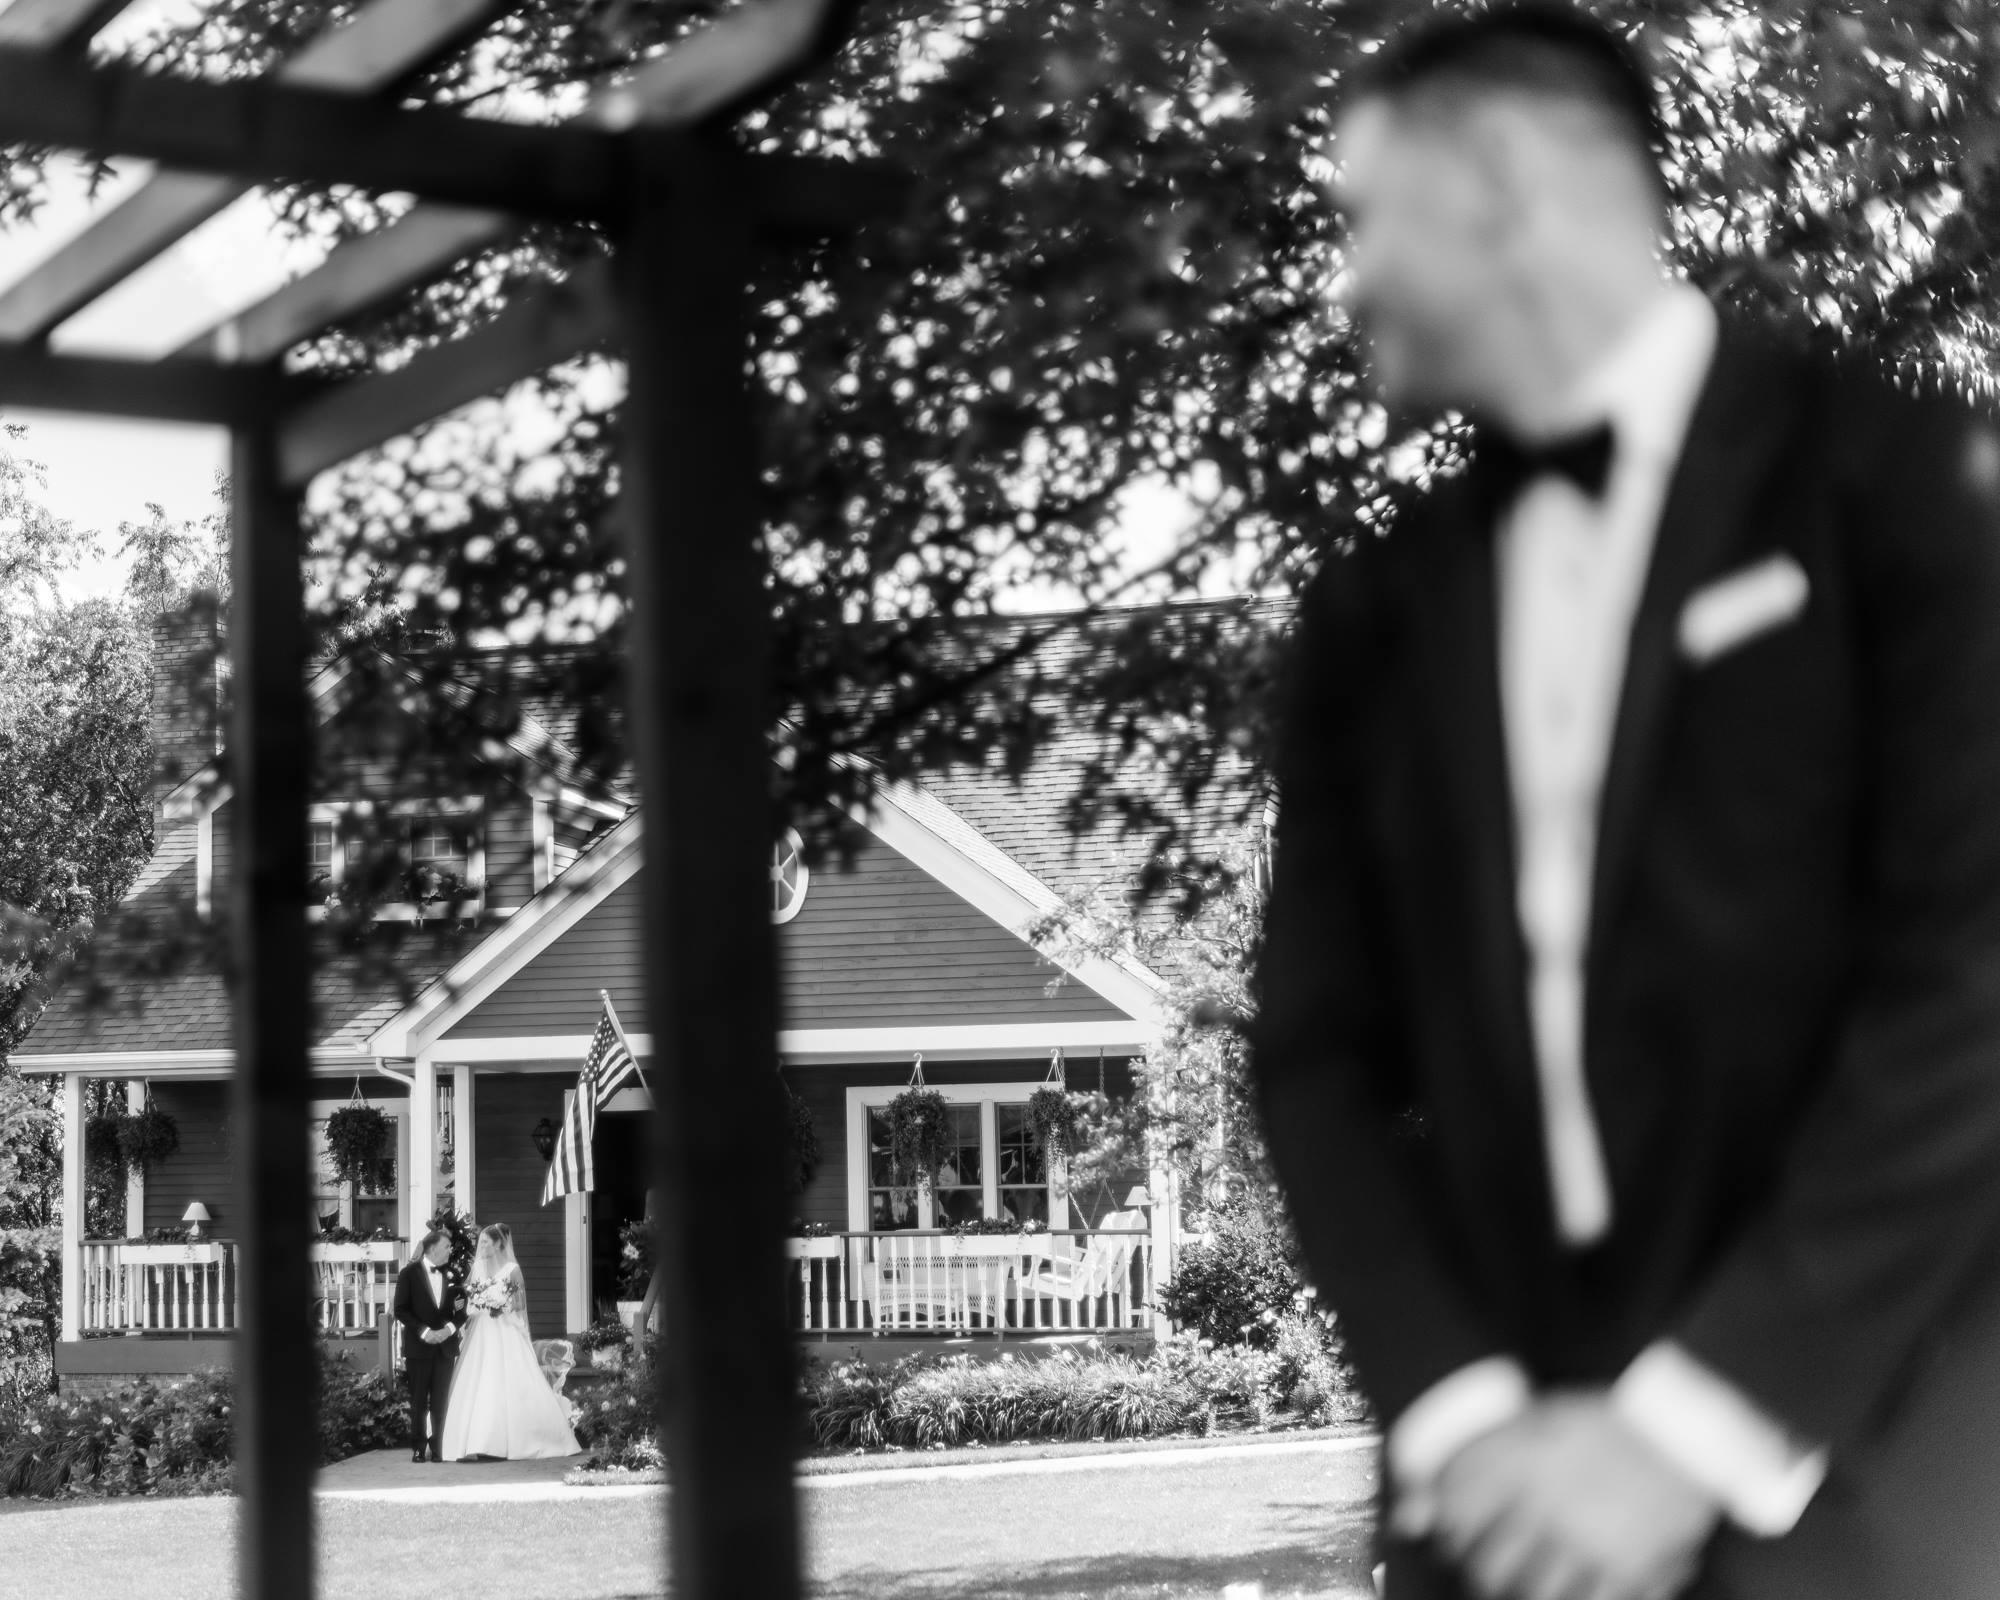 pittsburgh-pennsylvania-backyard-glam-chic-modern-classic-wedding-0020.jpg